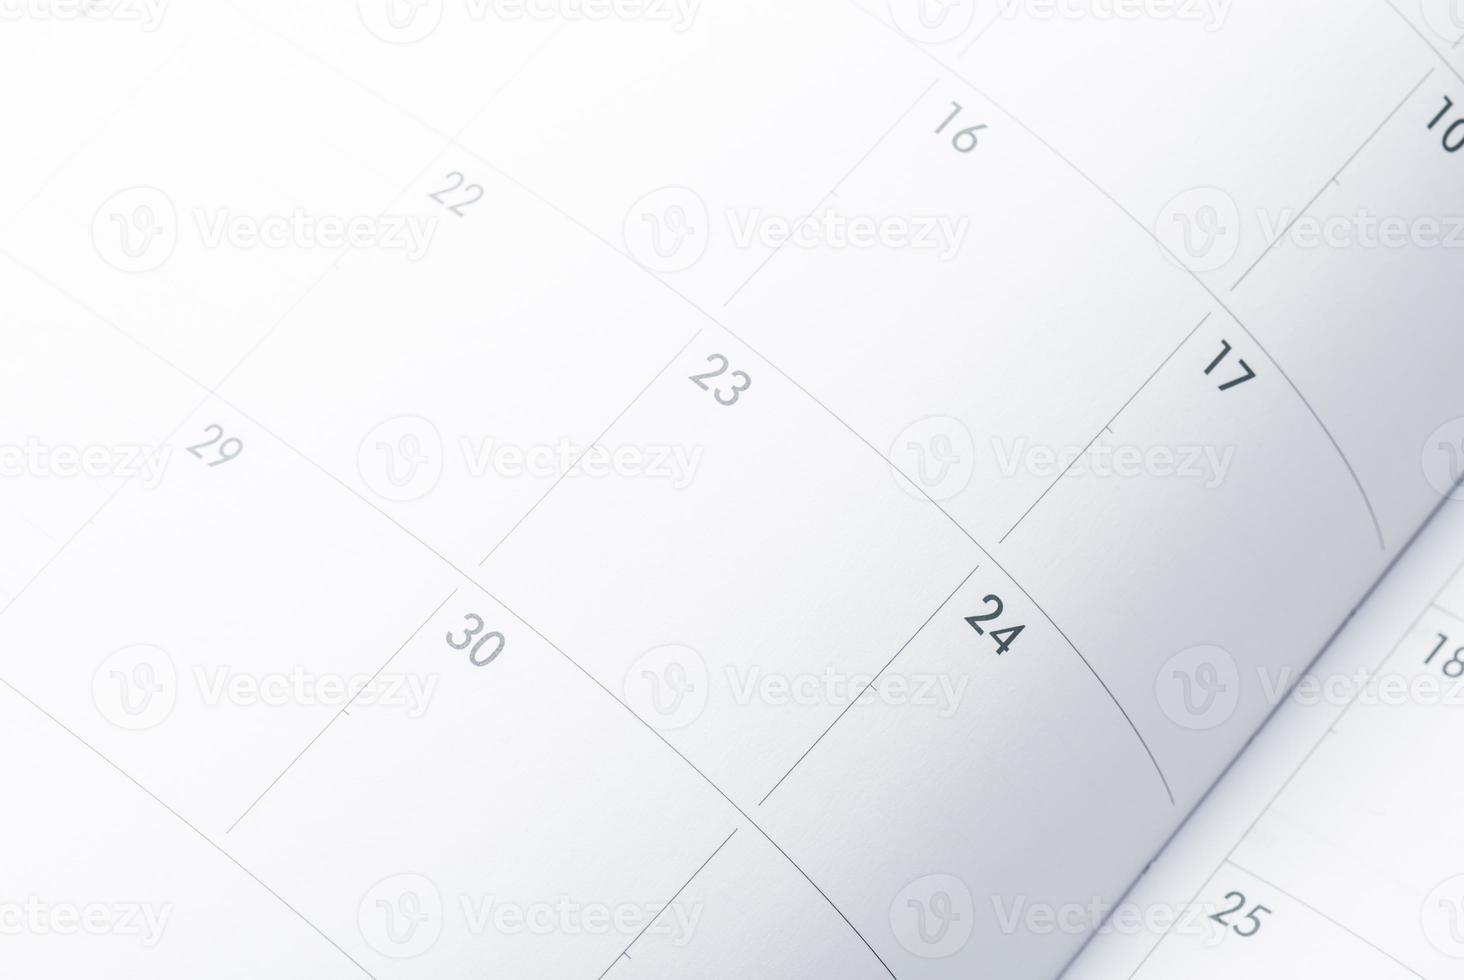 Calendar and deadline. photo